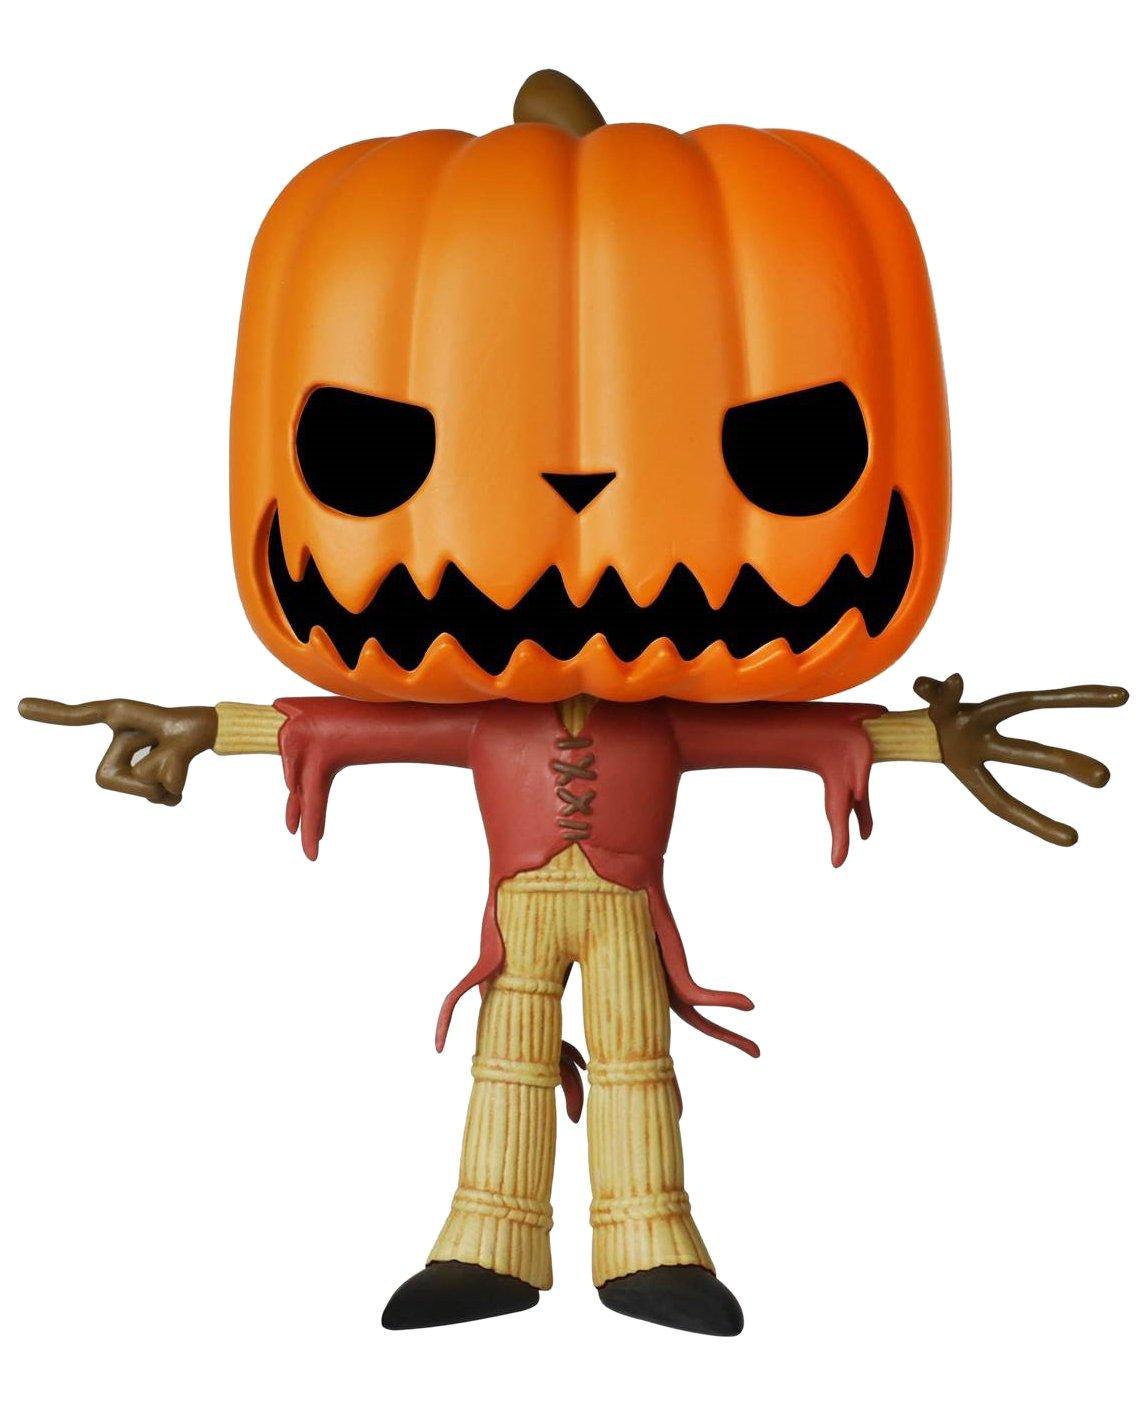 Amazon.com: Nightmare Before Christmas - Jack the Pumpkin King ...